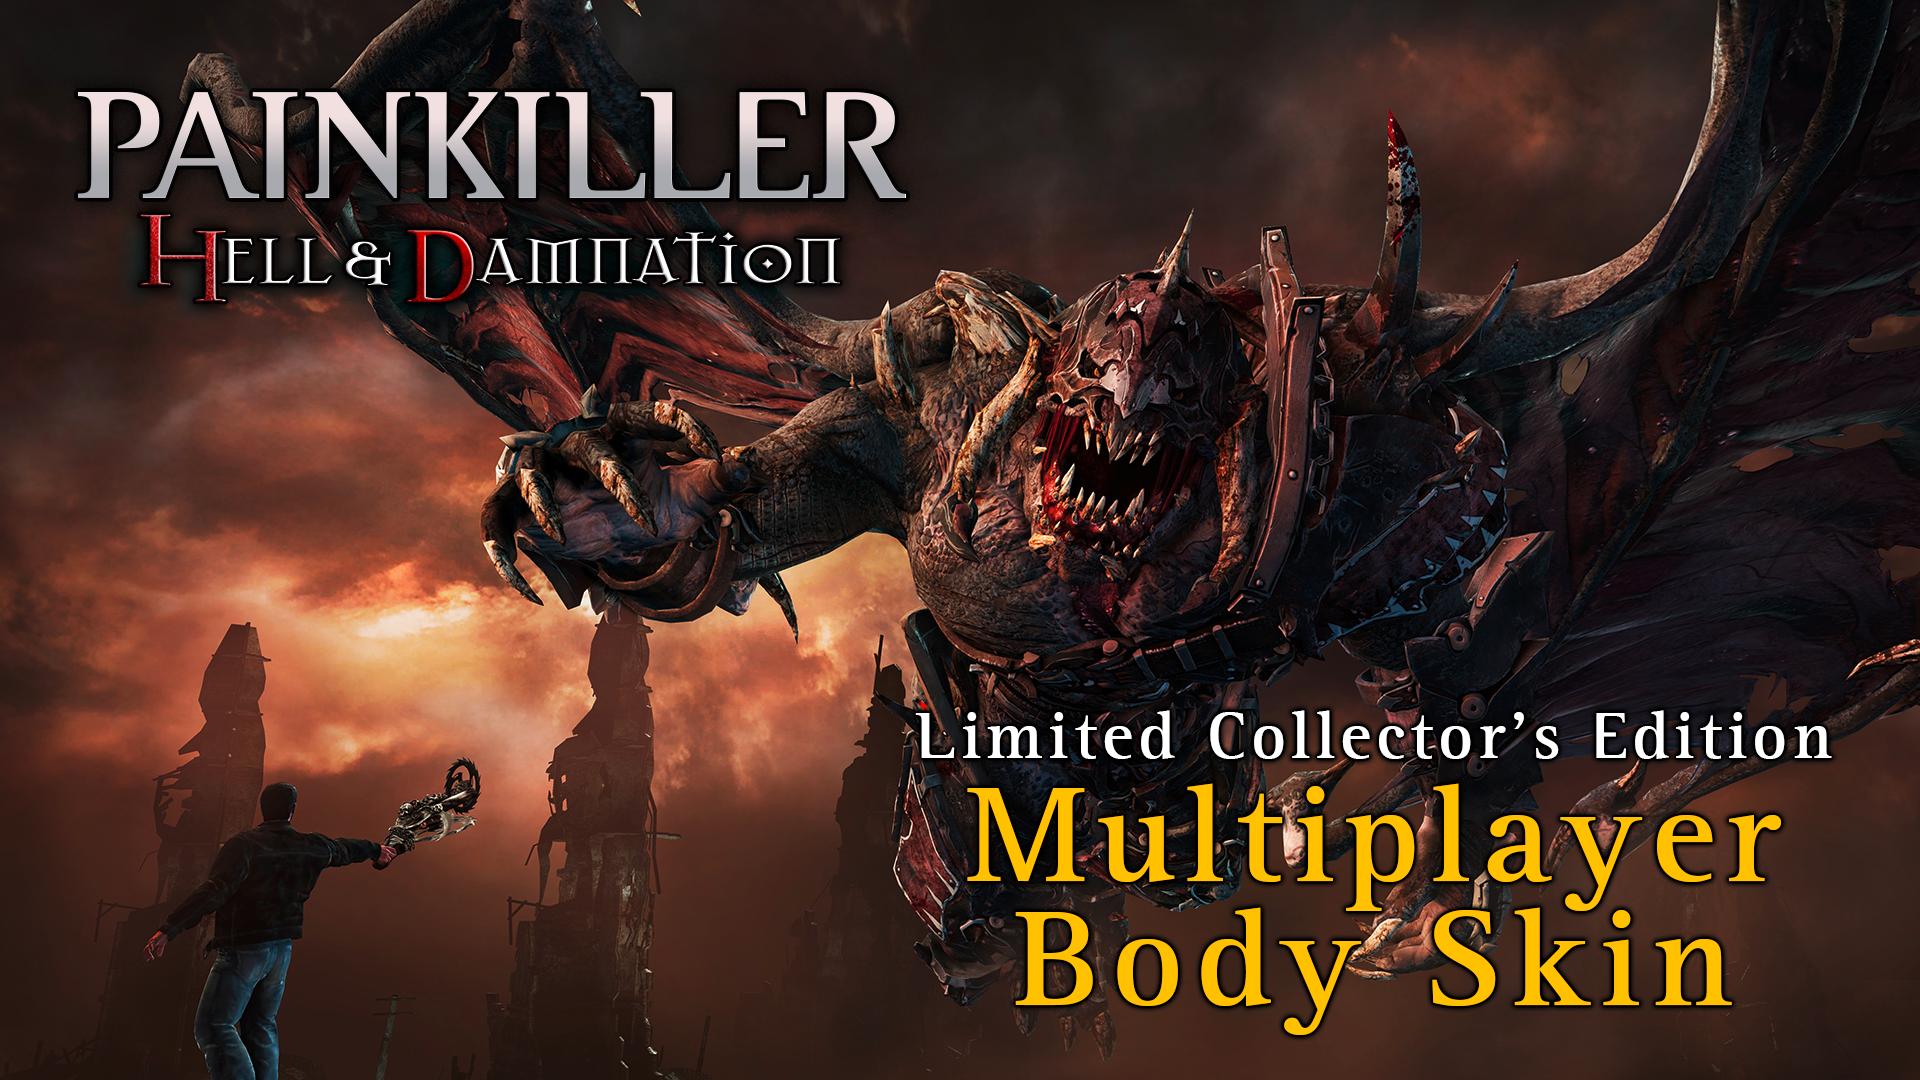 Painkiller Hell & Damnation: Multiplayer Body Skin Pack screenshot